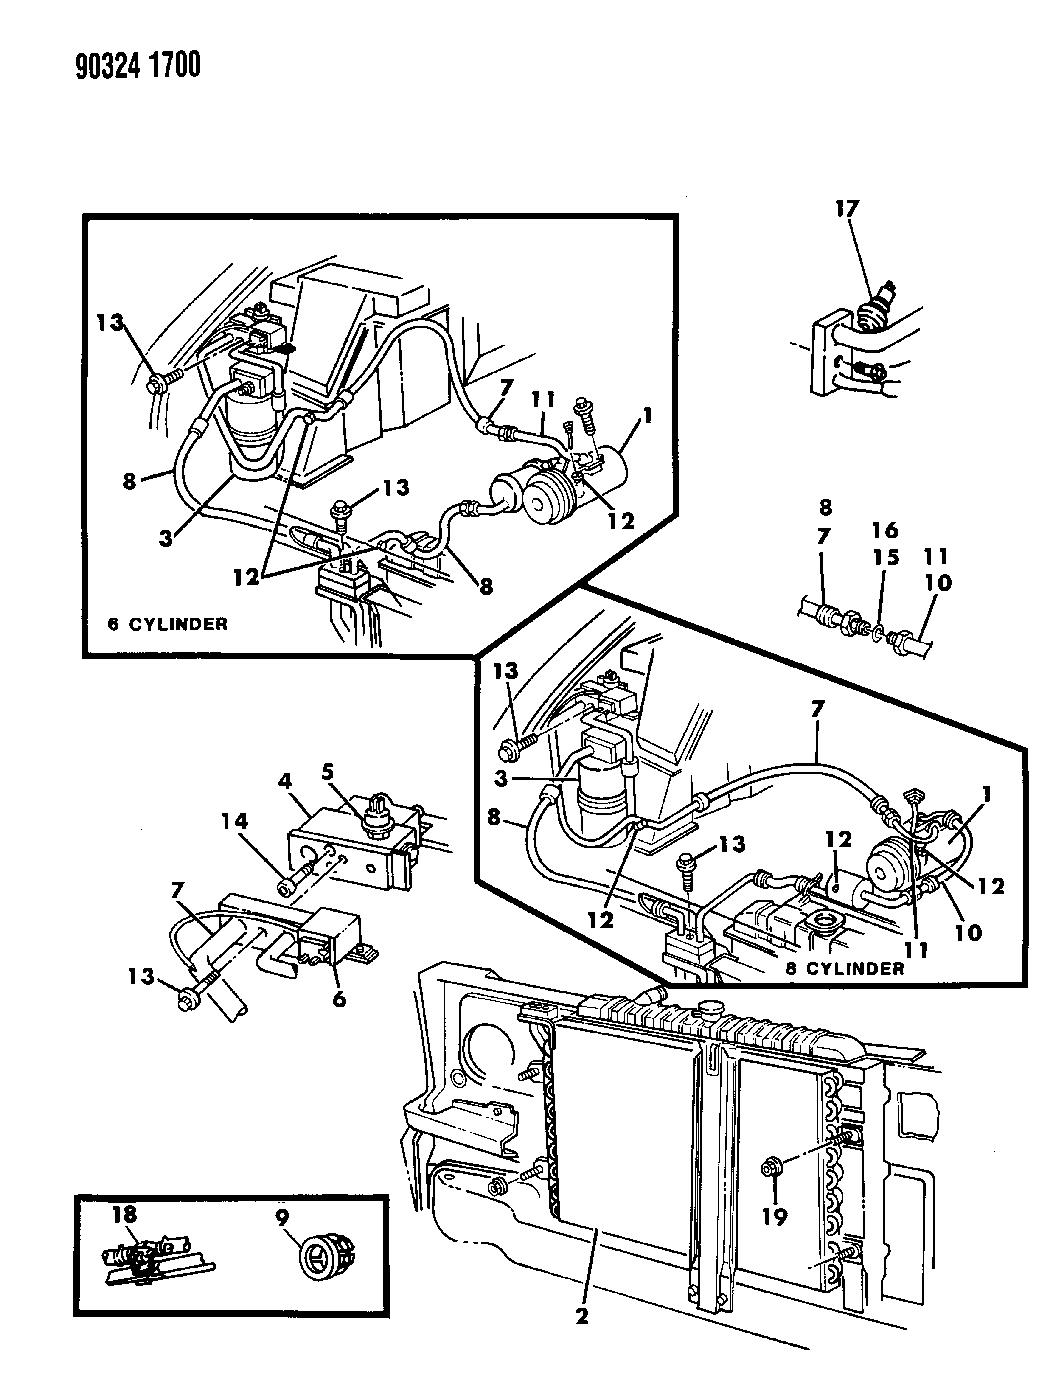 1992 Dodge Parts Diagram Wiring Diagrams Connection Connection Miglioribanche It